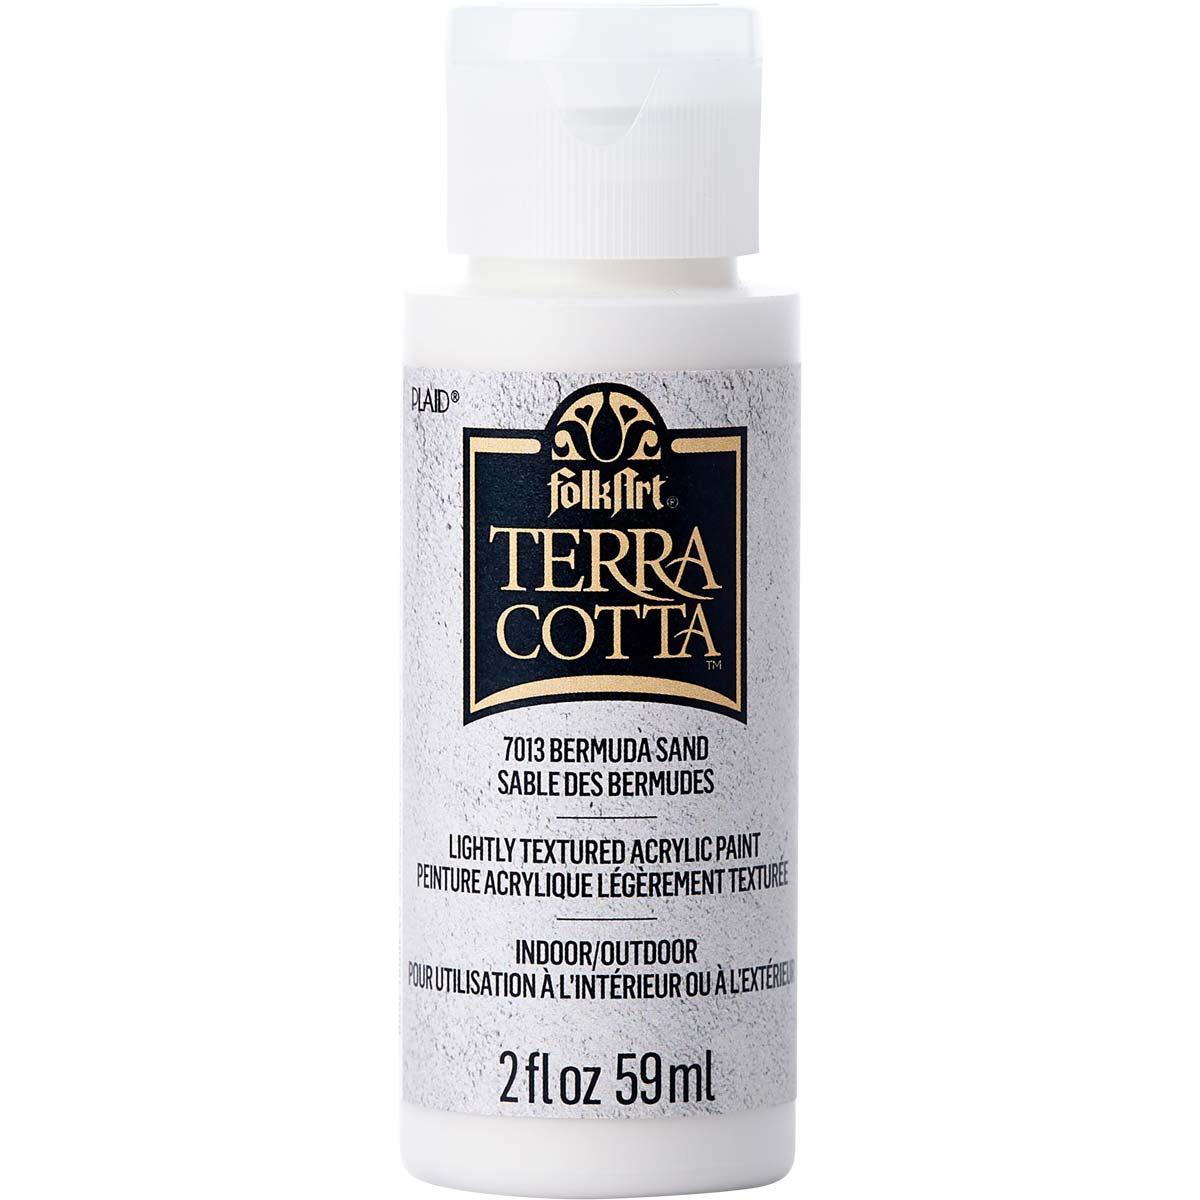 FolkArt ® Terra Cotta™ Acrylic Paint - Bermuda Sand, 2 oz. - 7013